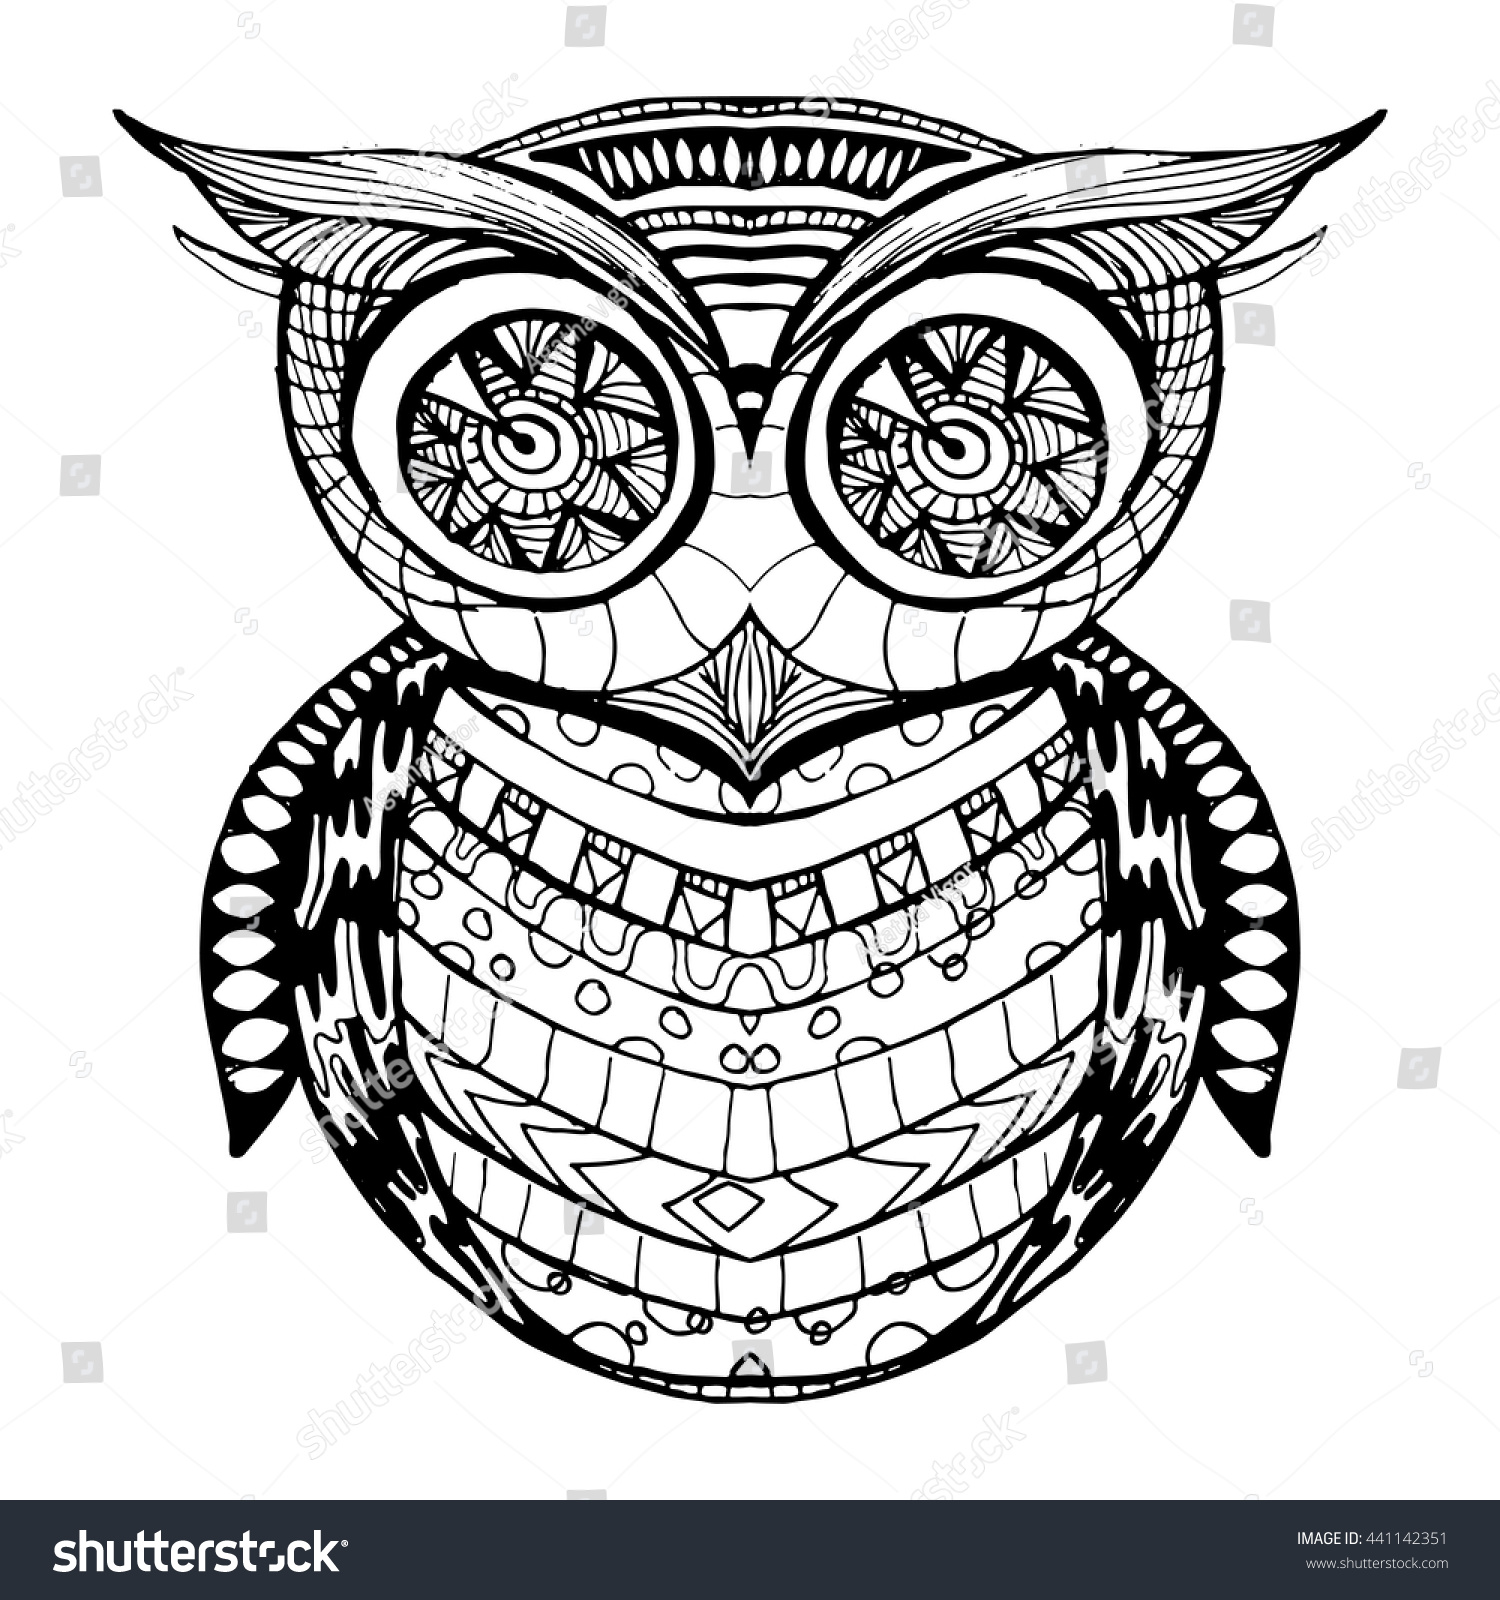 decorative ornamental owl zendoodle design element stock vector